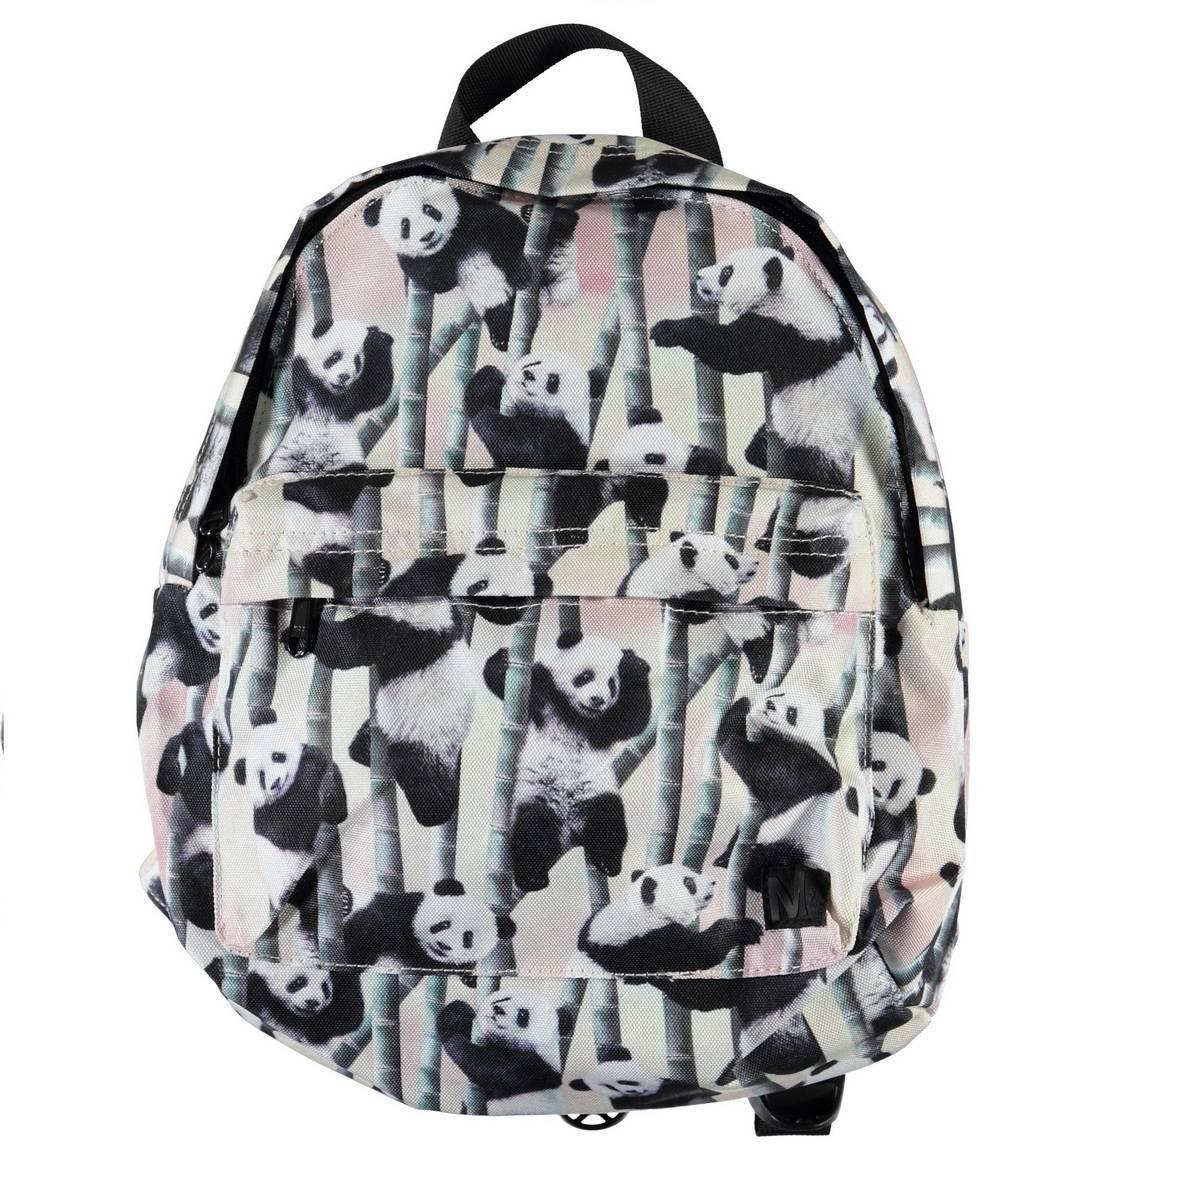 Рюкзак Molo Backpack Yin Yang